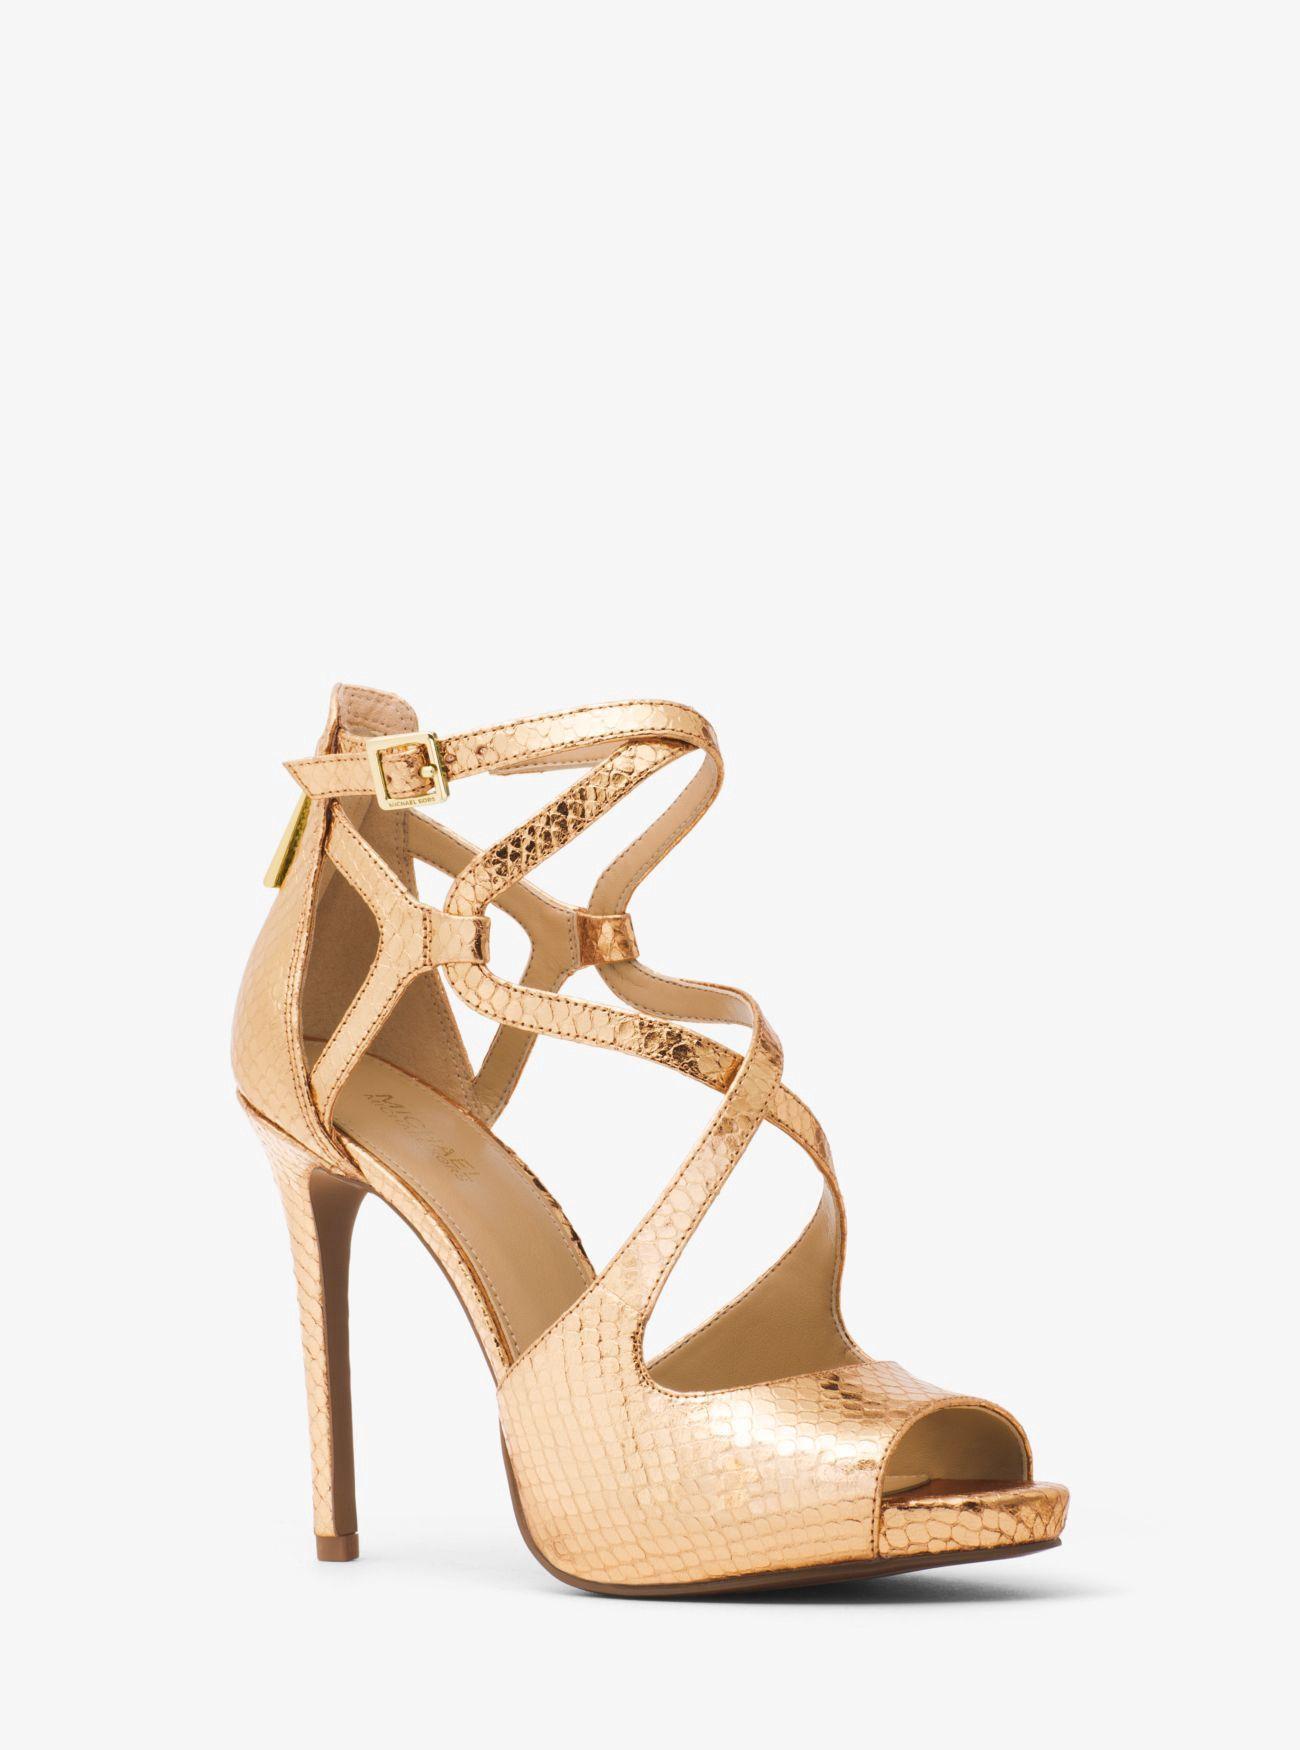 d21fbd7d2ca6 MICHAEL KORS Catia Metallic Embossed-Leather Sandal.  michaelkors  shoes